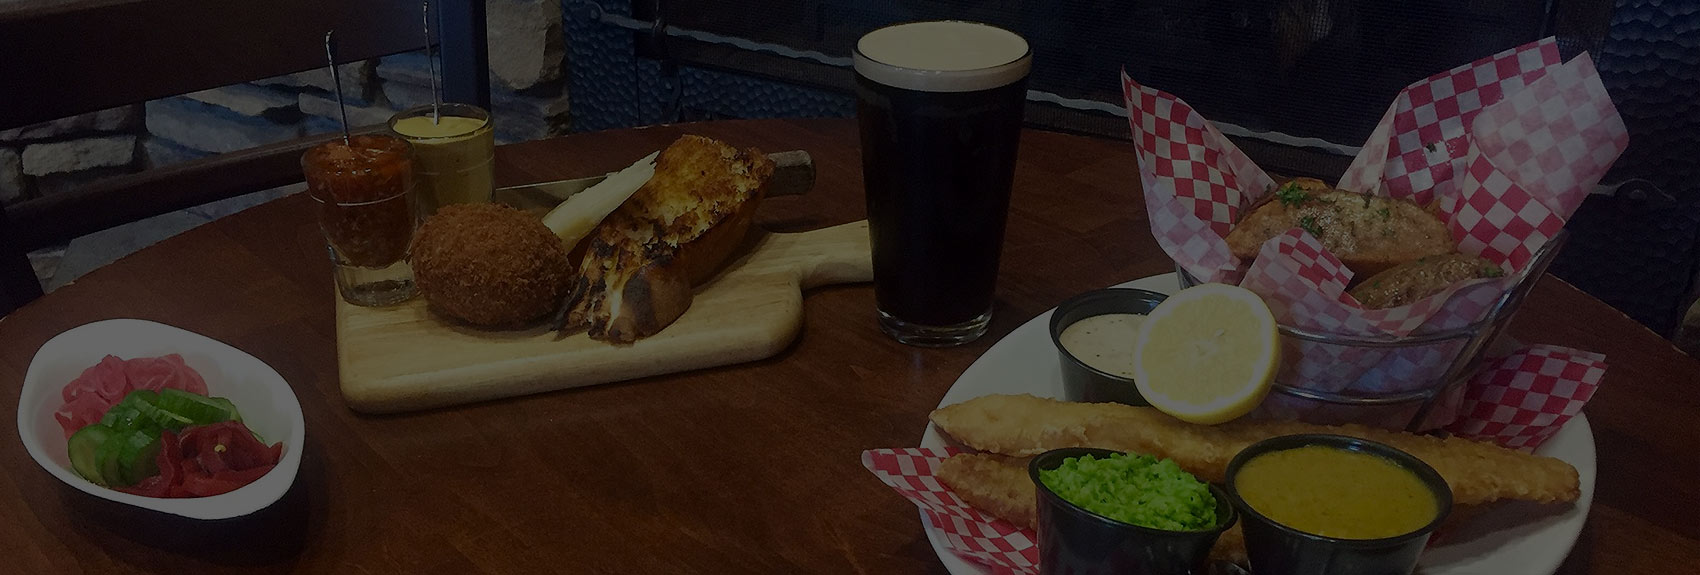 Irish American Menu - Kilpatrick's Pub, Ithaca NY